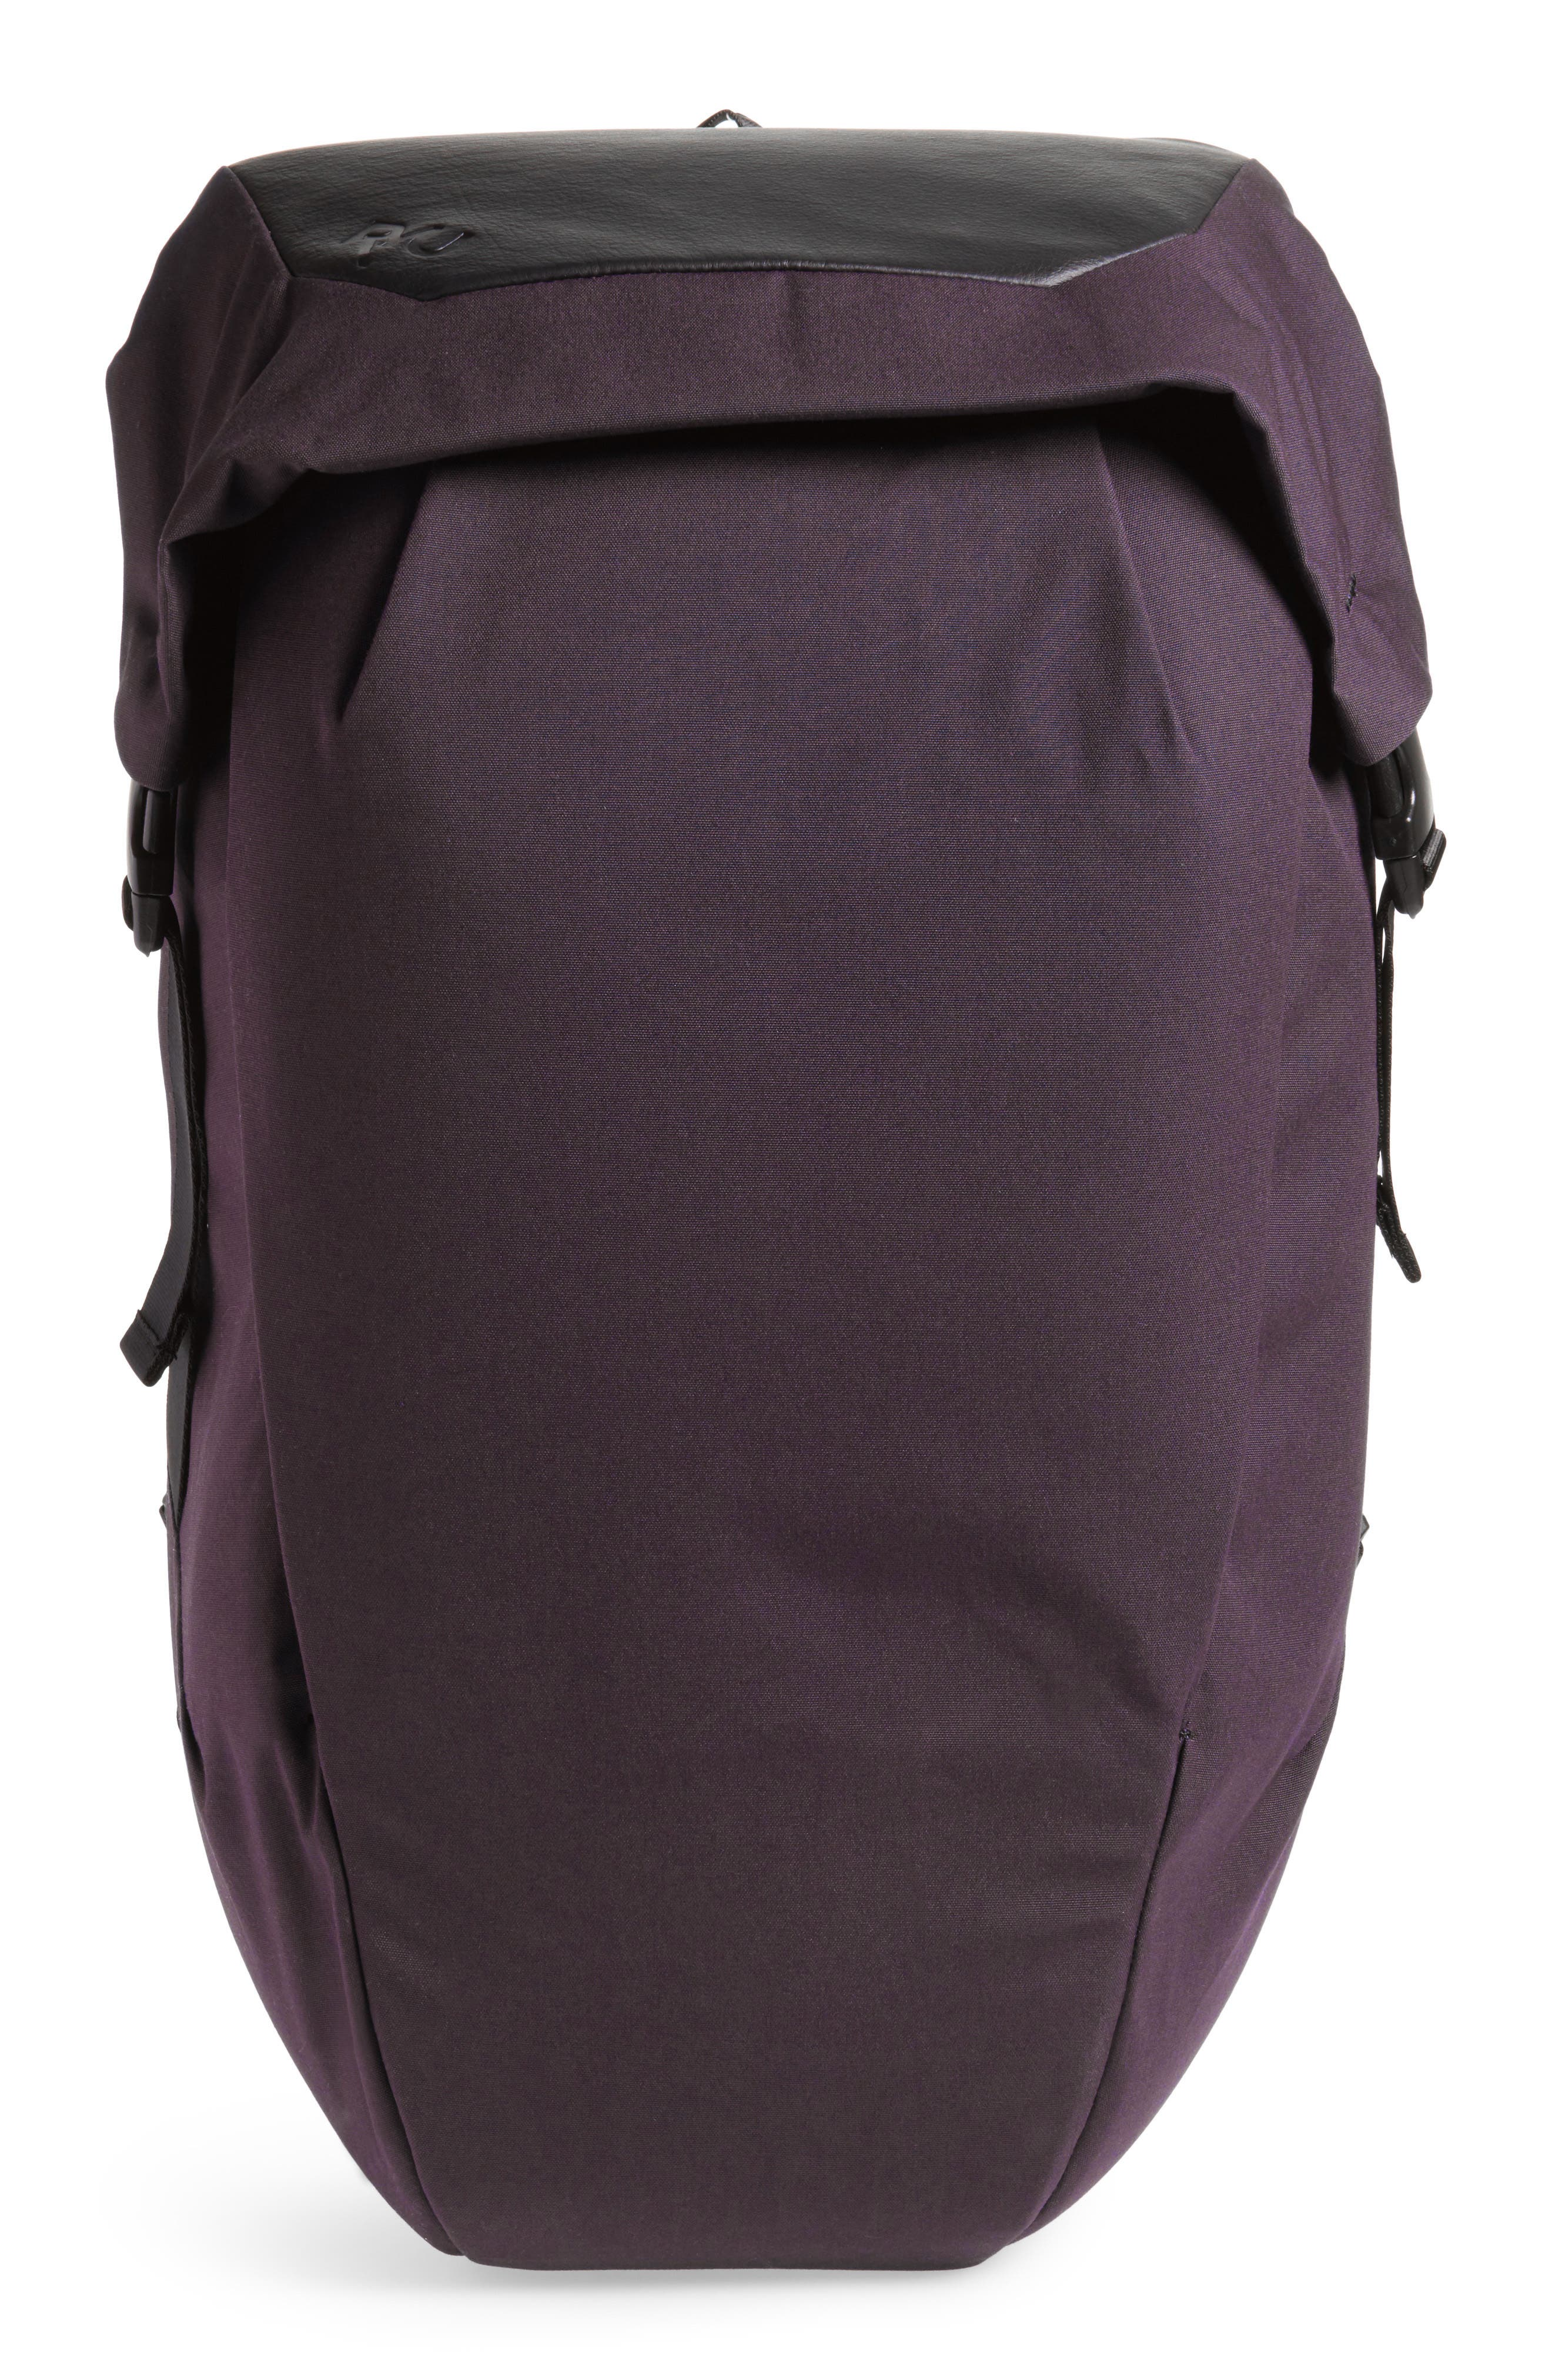 Locker Pack Lux Backpack,                             Main thumbnail 1, color,                             Port